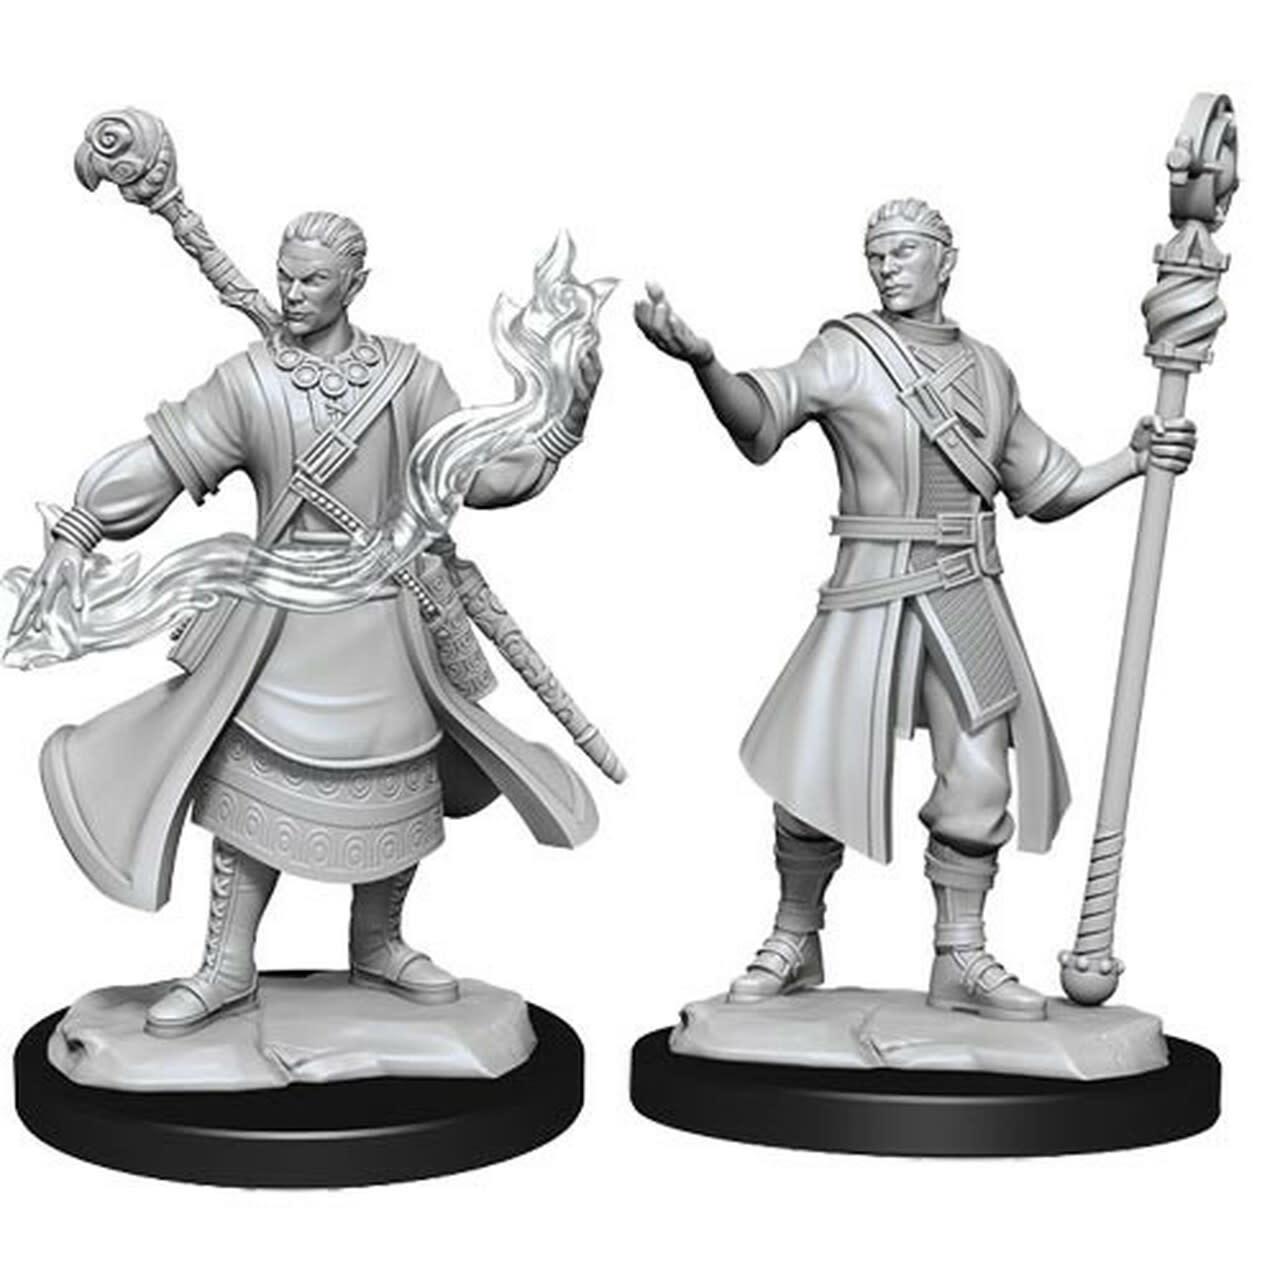 Wizkids D&D Nolzurs Miniature: Half-Elf Wizard Male